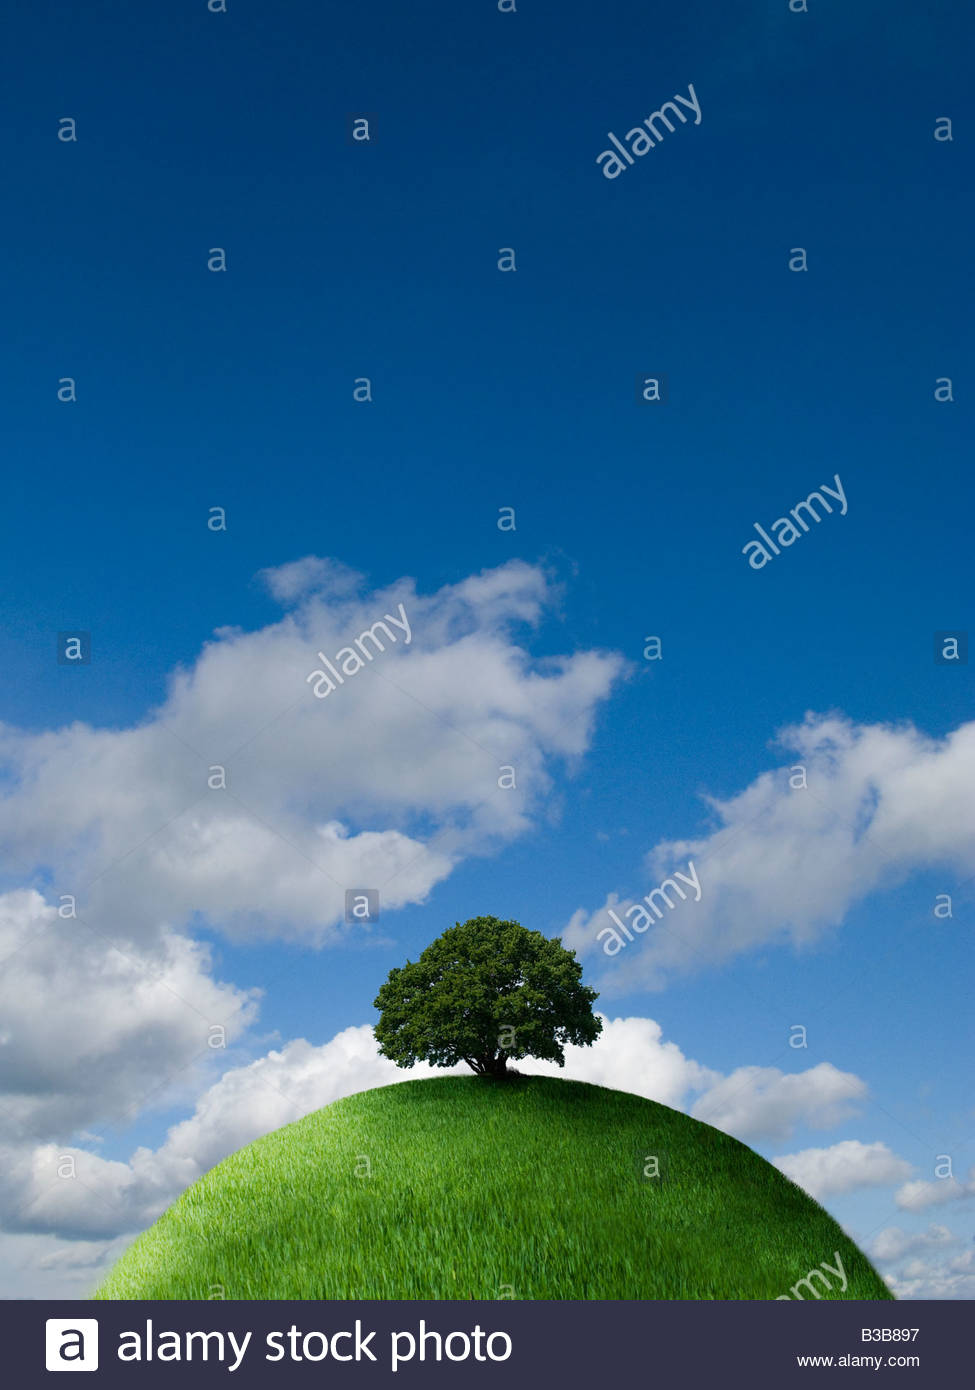 Tree on top of grassy globe - Stock Image